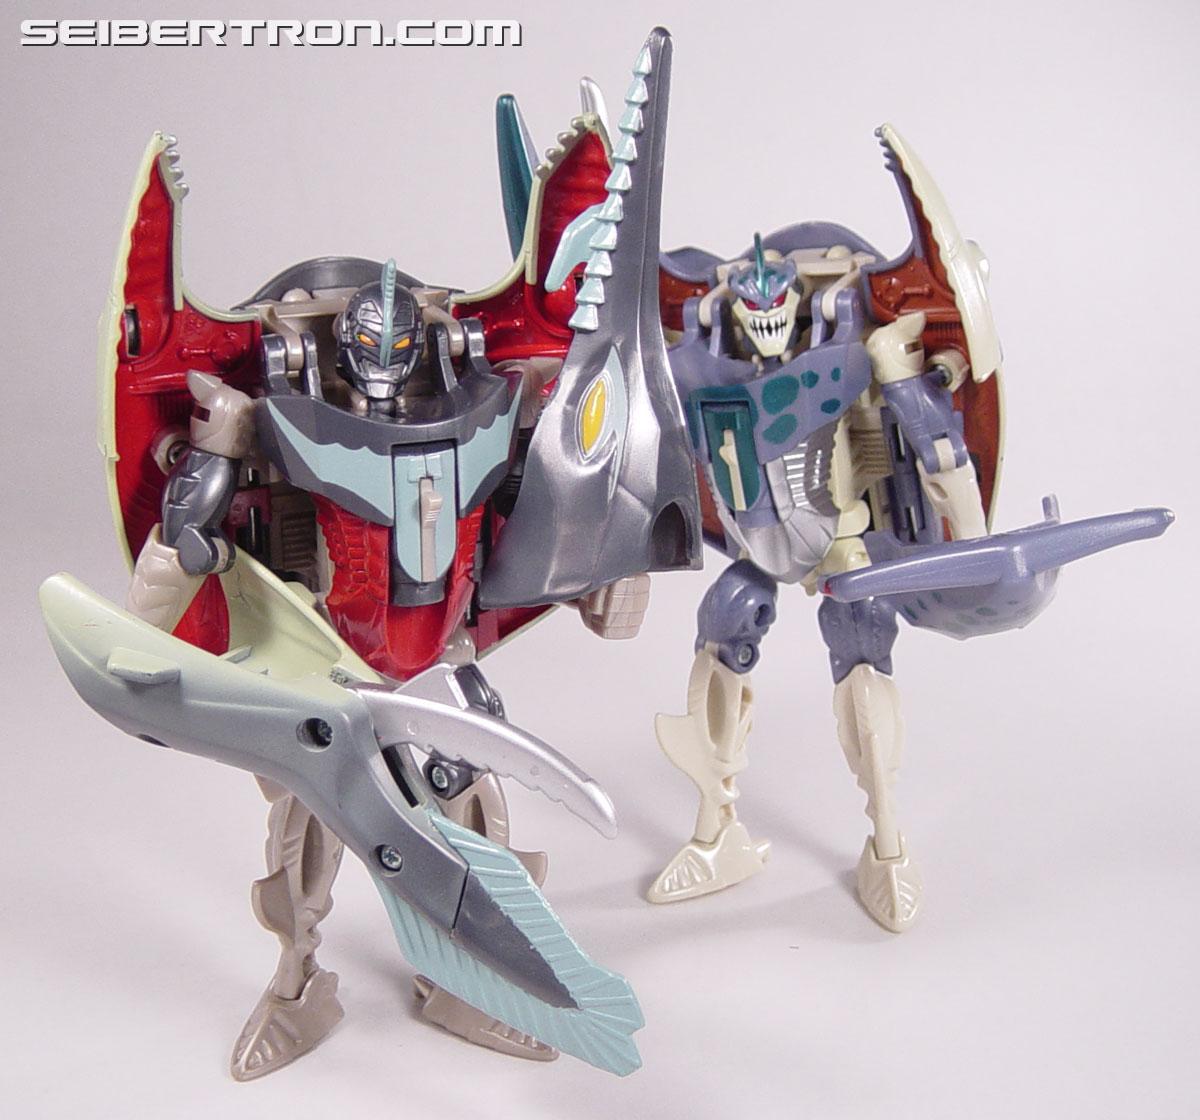 Transformers Beast Wars Neo Sharp Edge (Image #96 of 109)